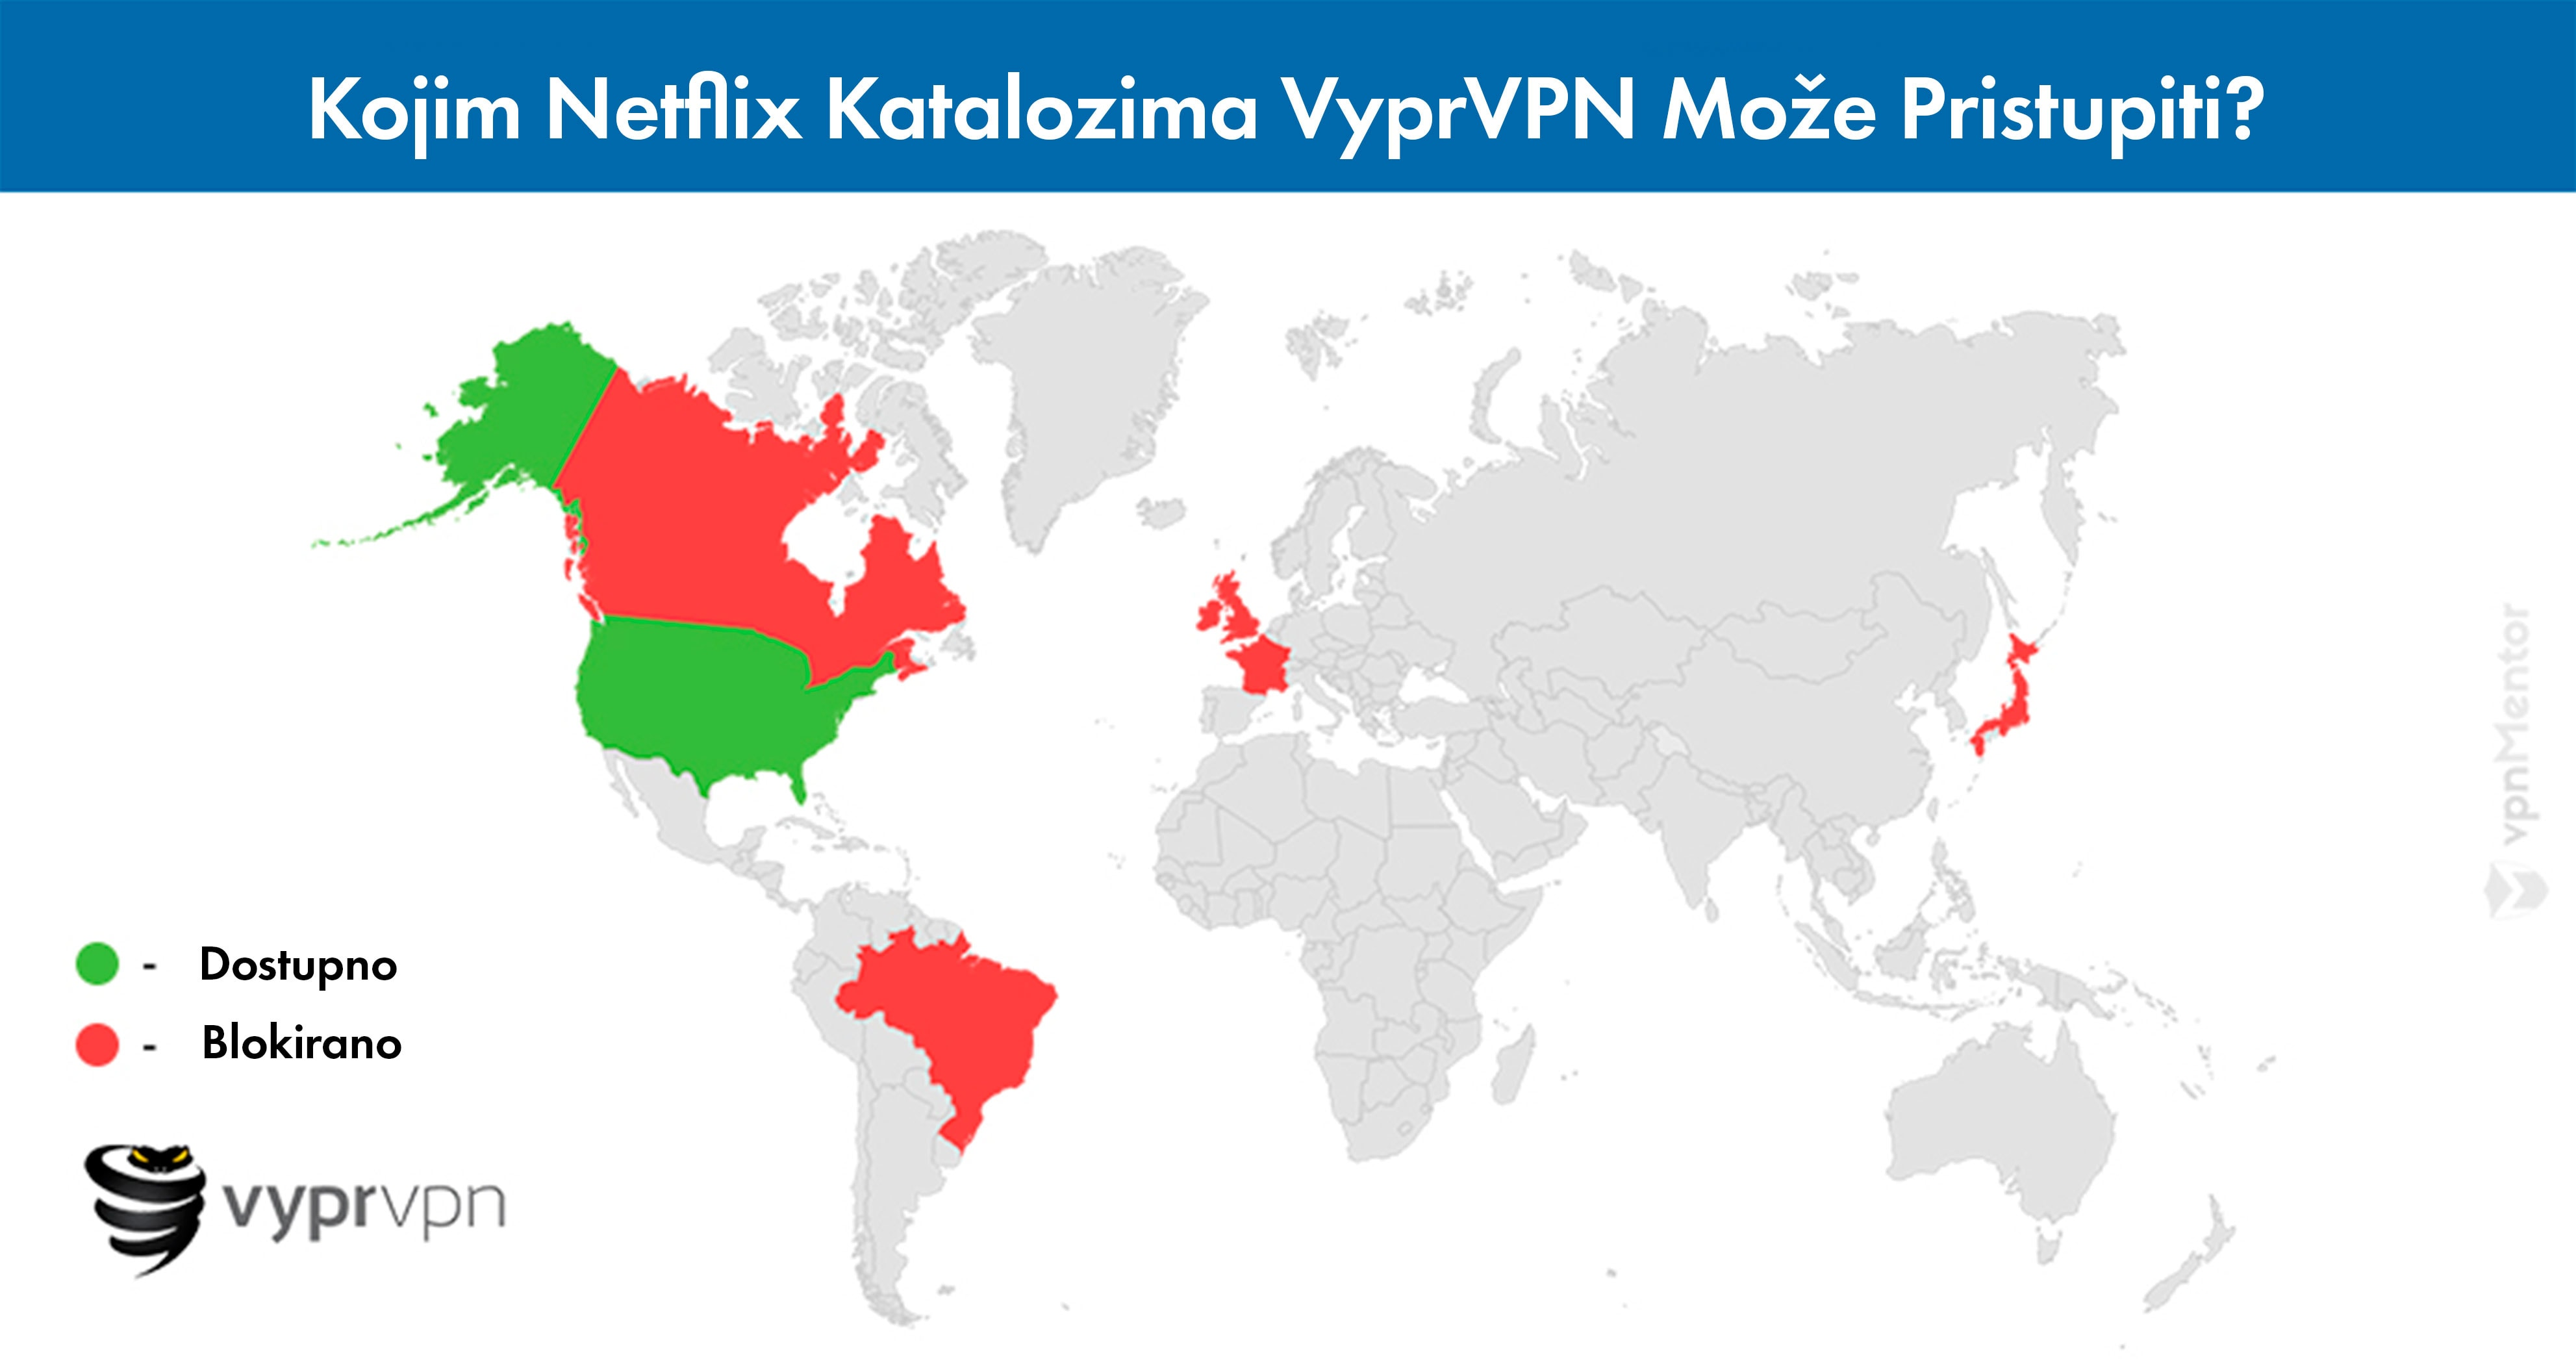 vyprvpn pristup netflix katalozima